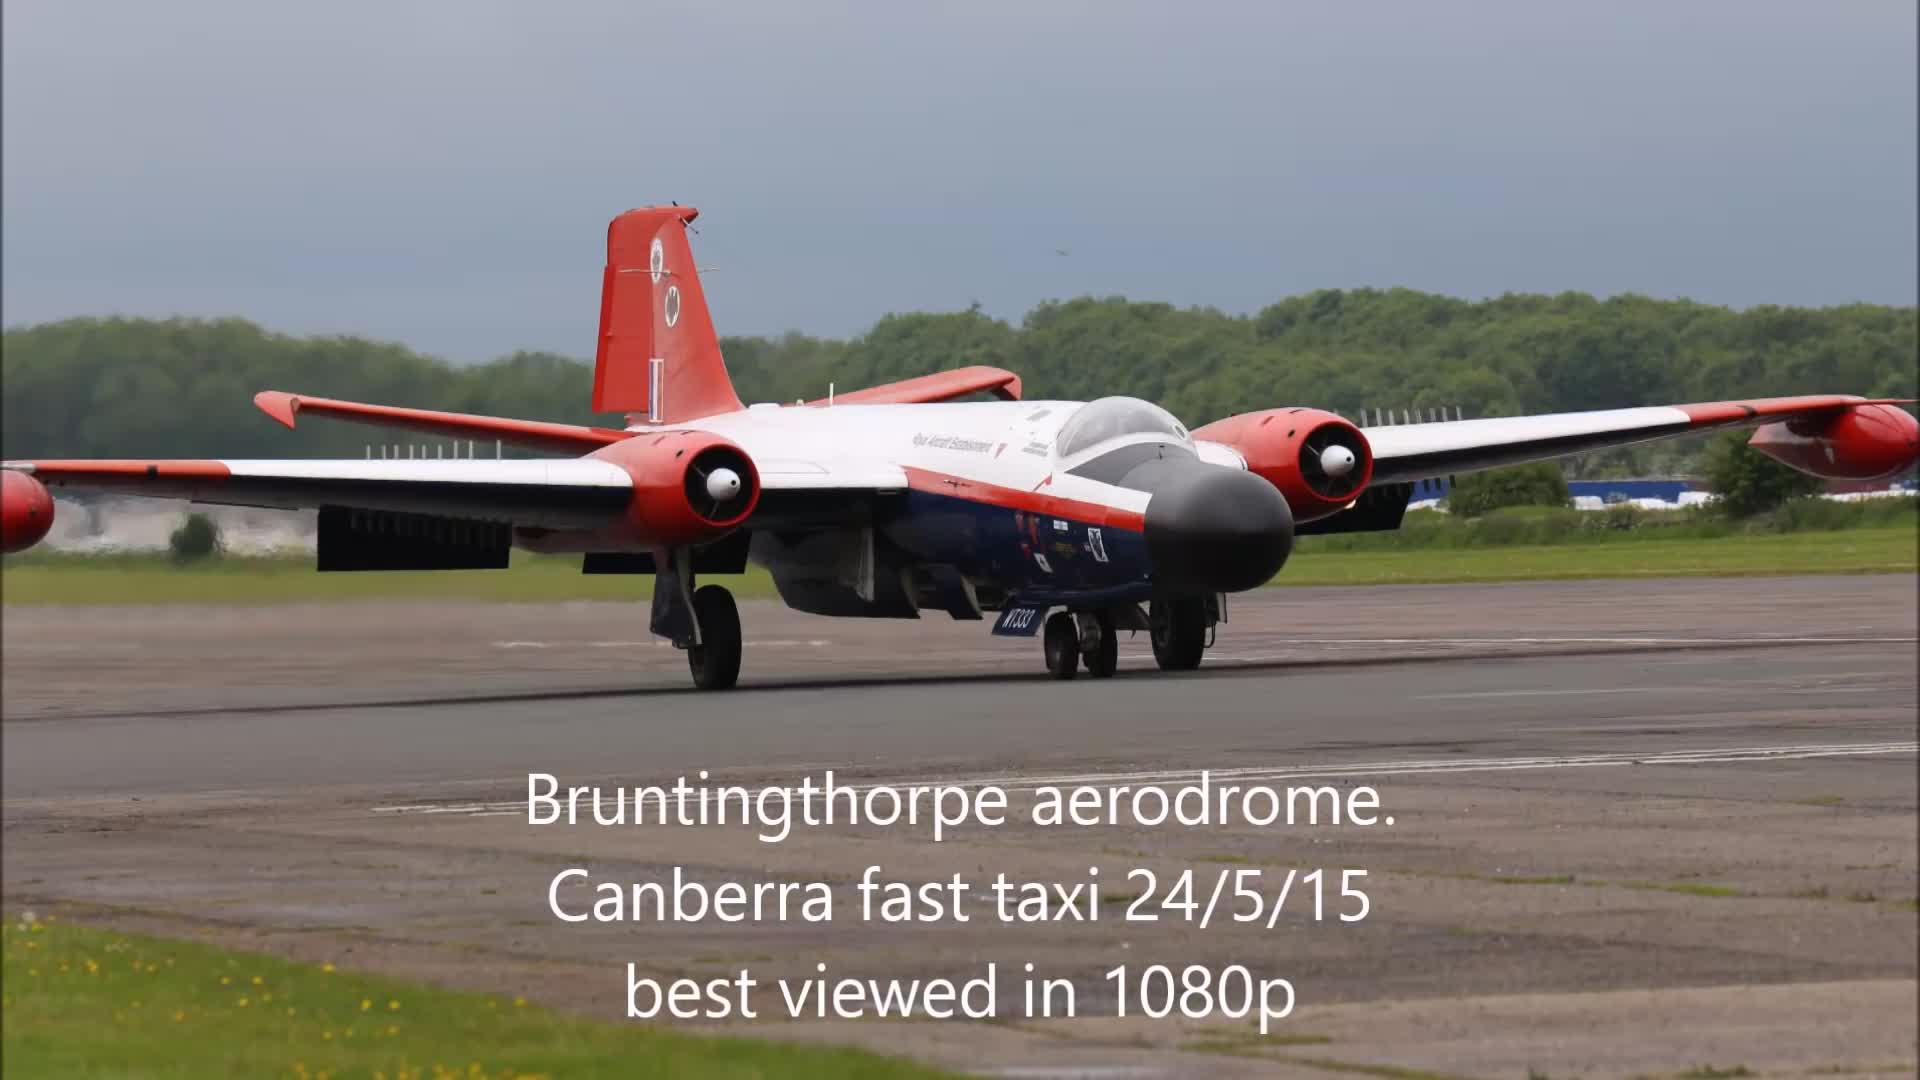 Bruntingthorpe Aerodrome (Airport), aviation, bruntingthorpe, E.E. Canberra cartridge start/taxi at Bruntingthorpe 24/5/15 GIFs